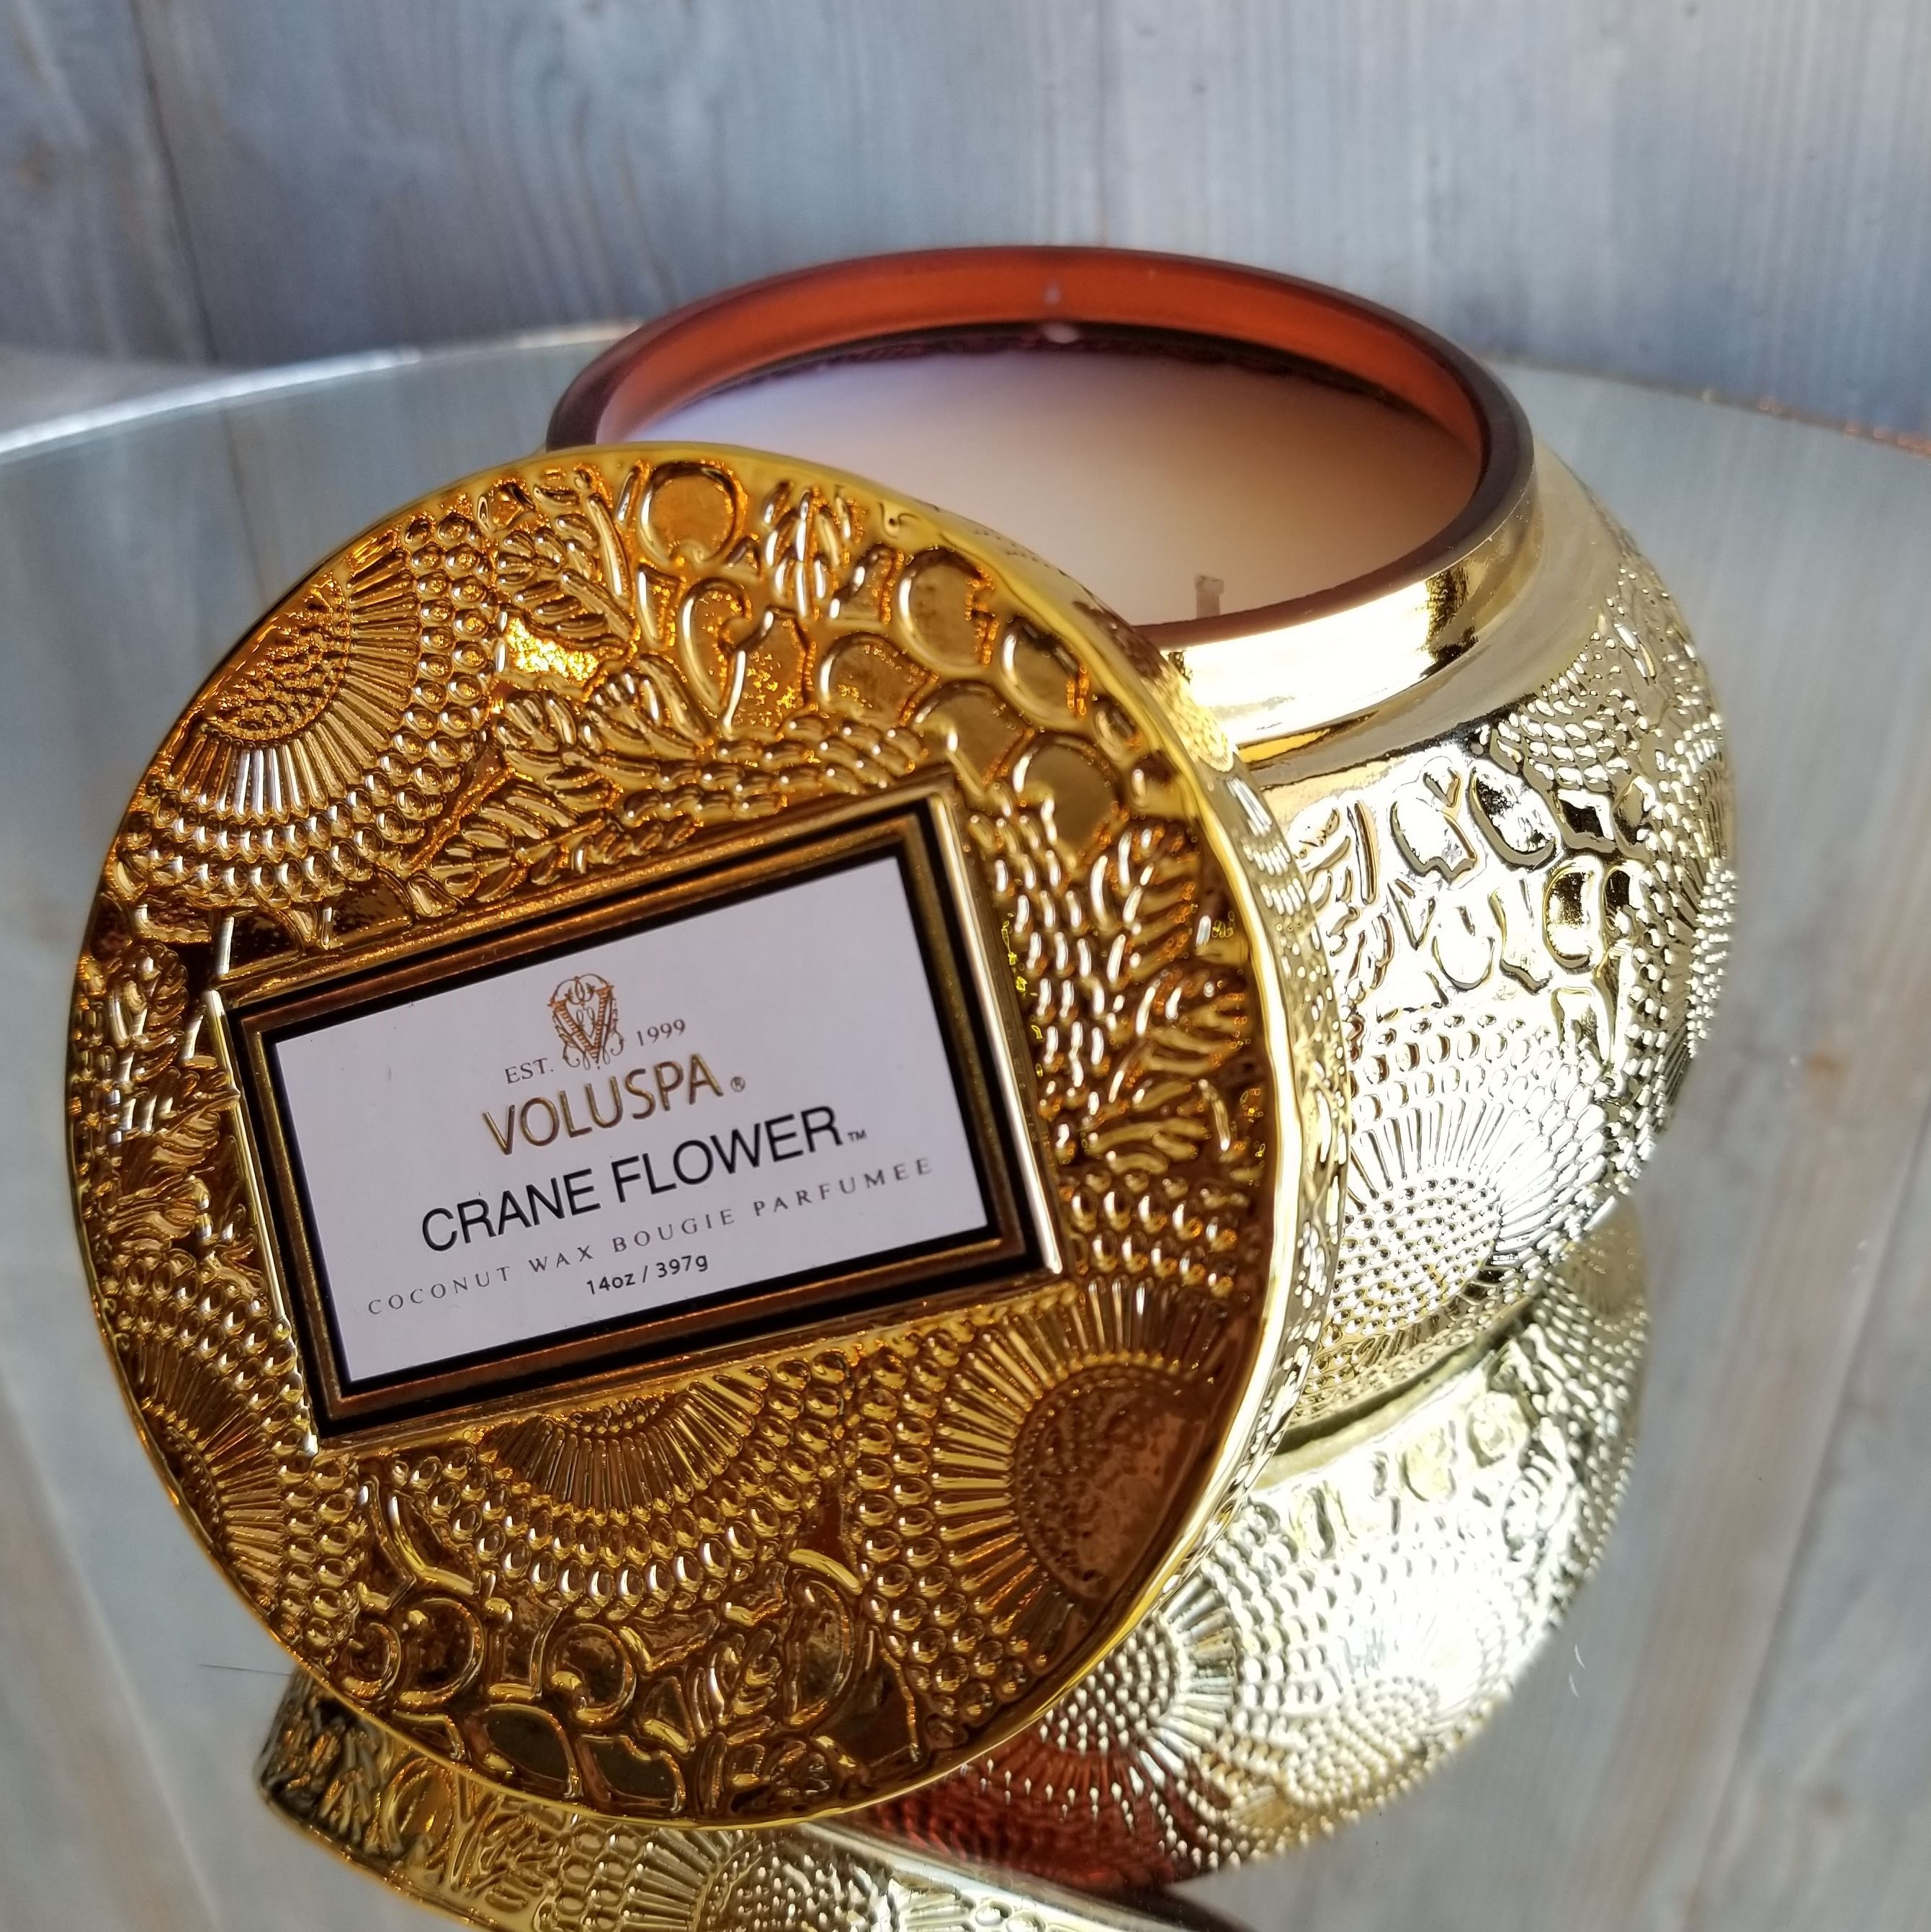 Voluspa Embossed Glass Candle: Crane Flower